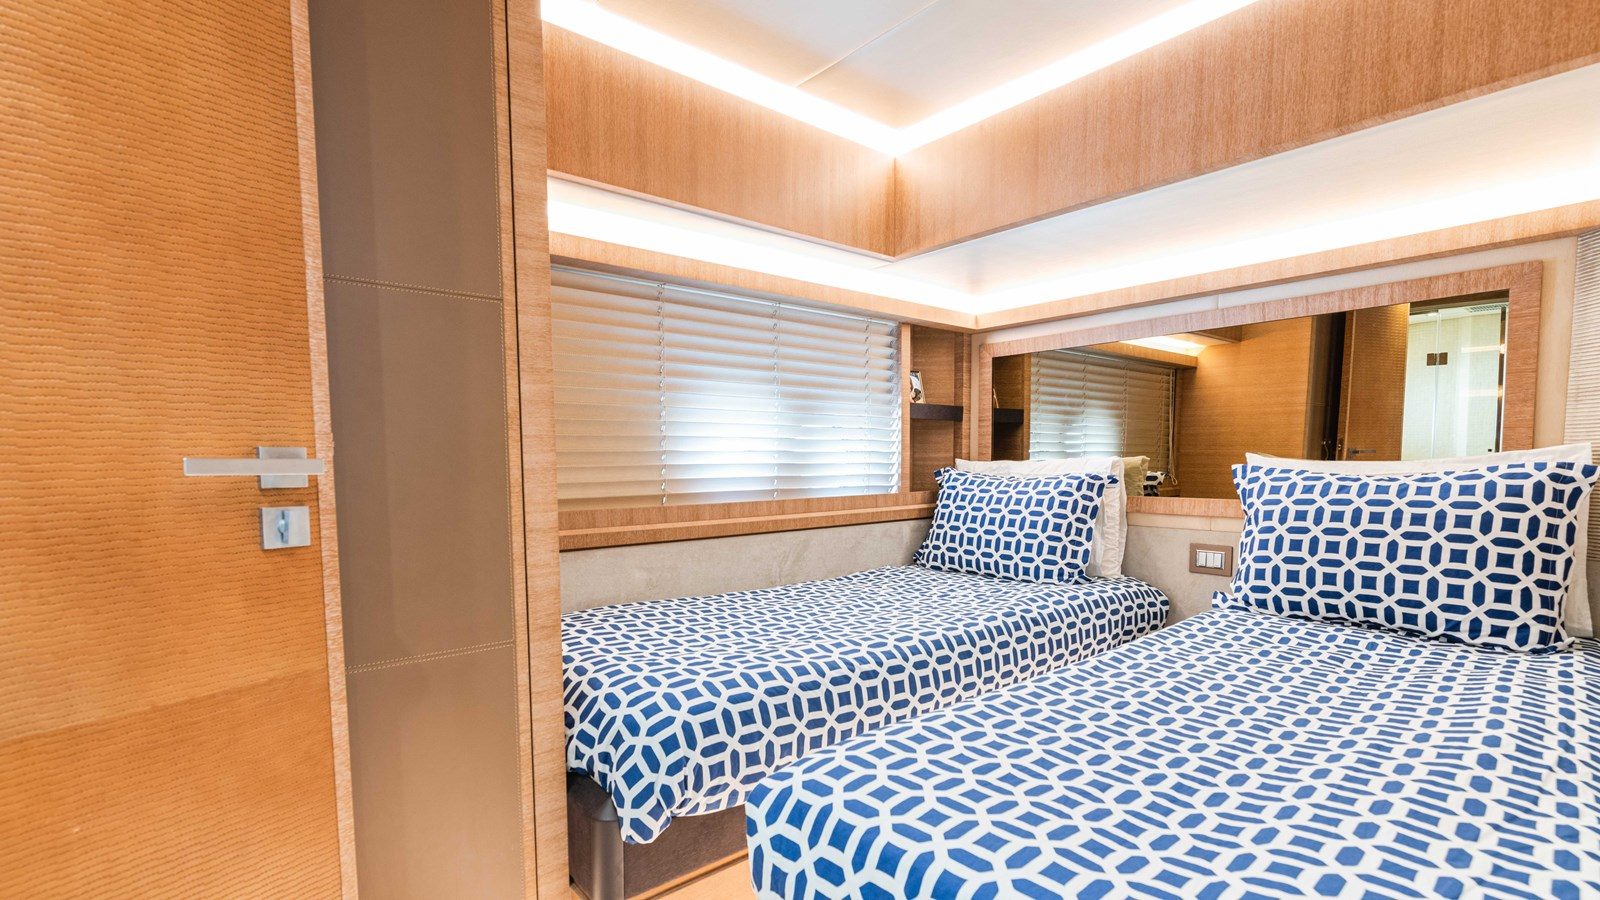 76 Monte Carlo (38 of 127) 2014 MONTE CARLO YACHTS Motoryacht Motor Yacht 2825243